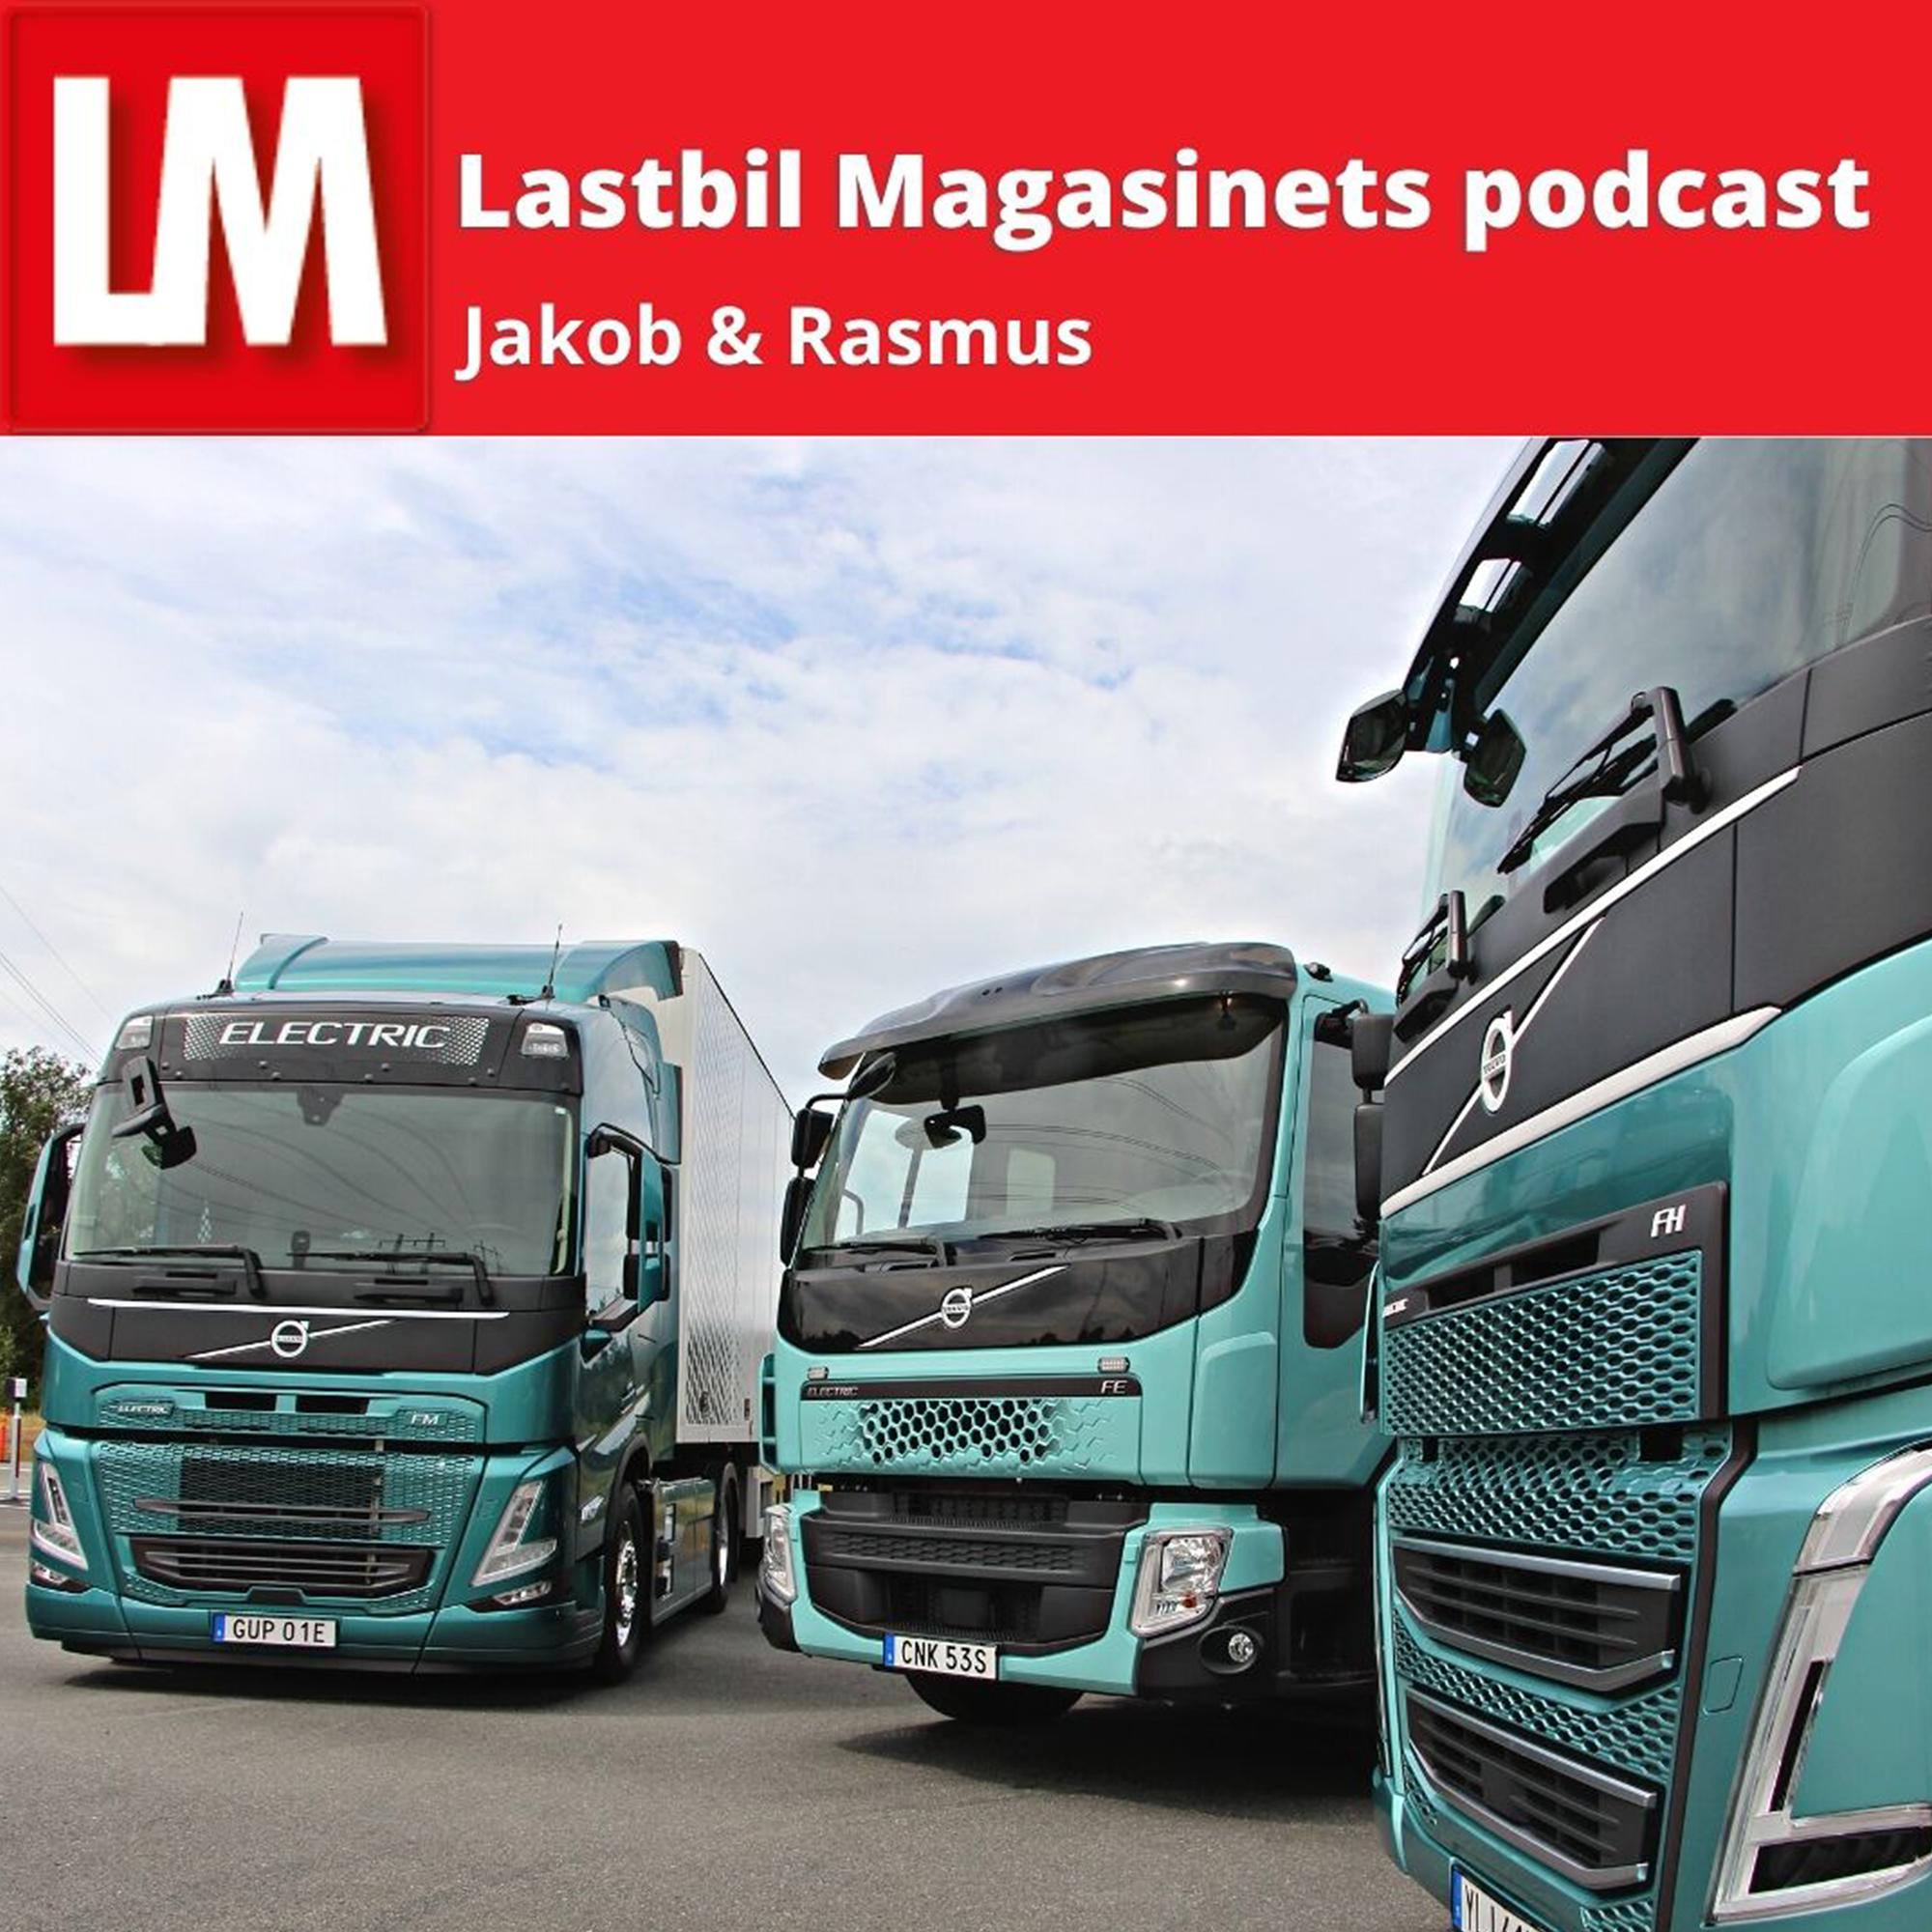 Artwork for podcast Lastbil Magasinet podcast